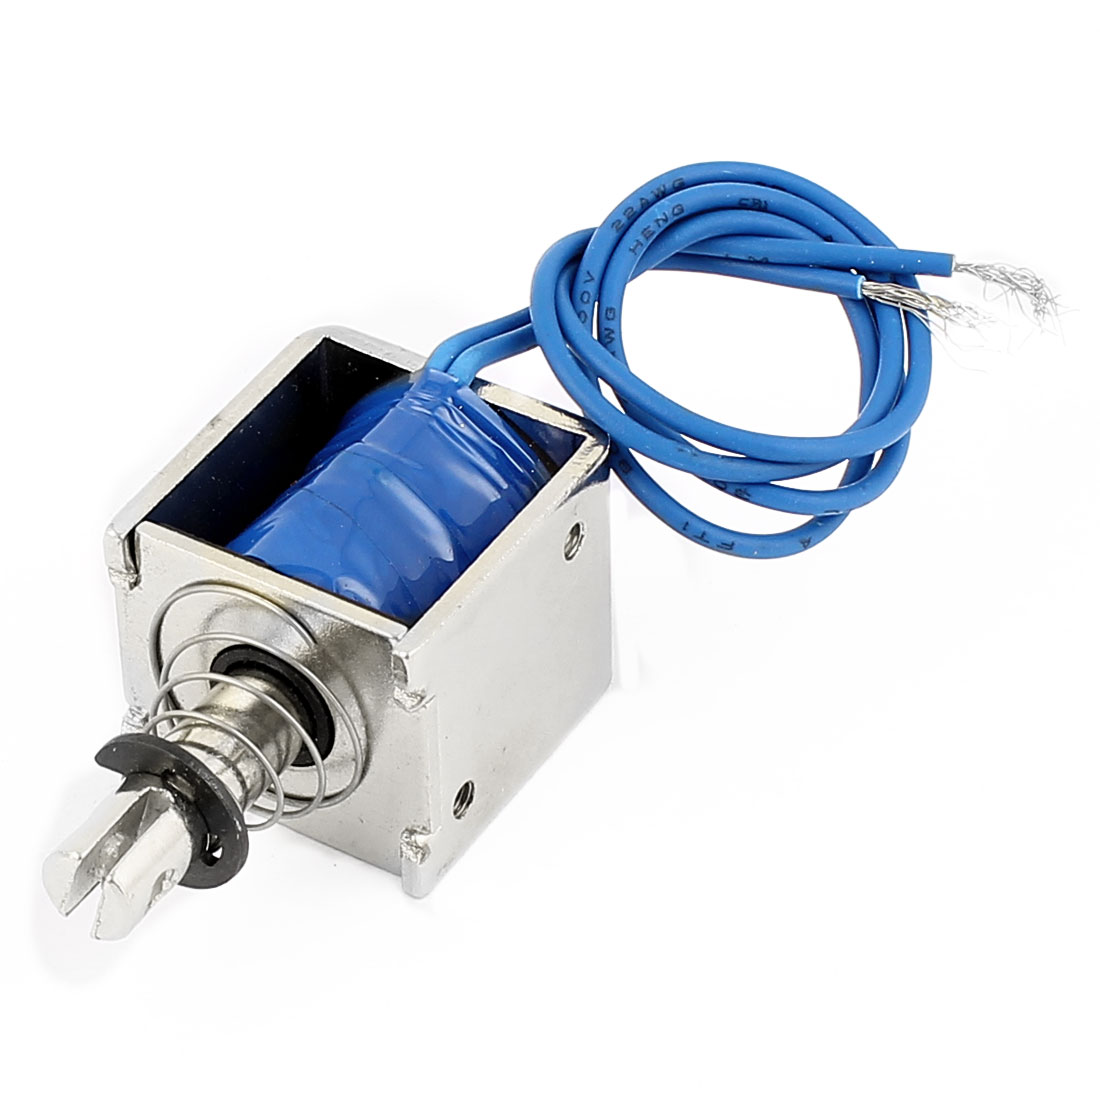 XRN-0826 DC 12V 10mm 20N Push Pull Type DIY DC Solenoid Electromagnet Magnet